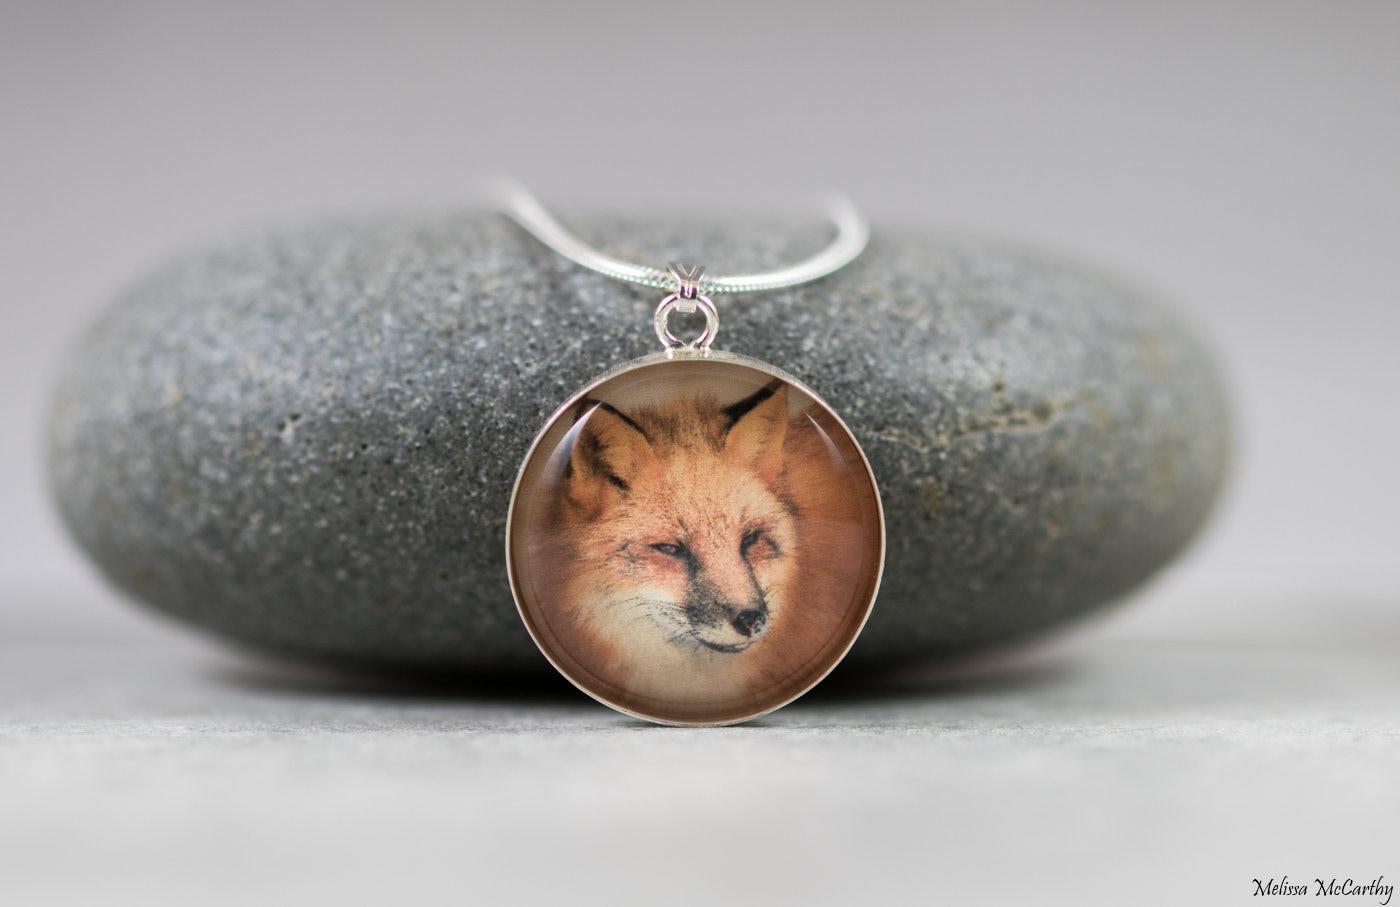 e703c2767c40a Red Fox Sterling Silver Photo Necklace - Mini Tiny Animal Photography  Portrait, Nature Wildlife Jewelry, Glass Pendant, Orange